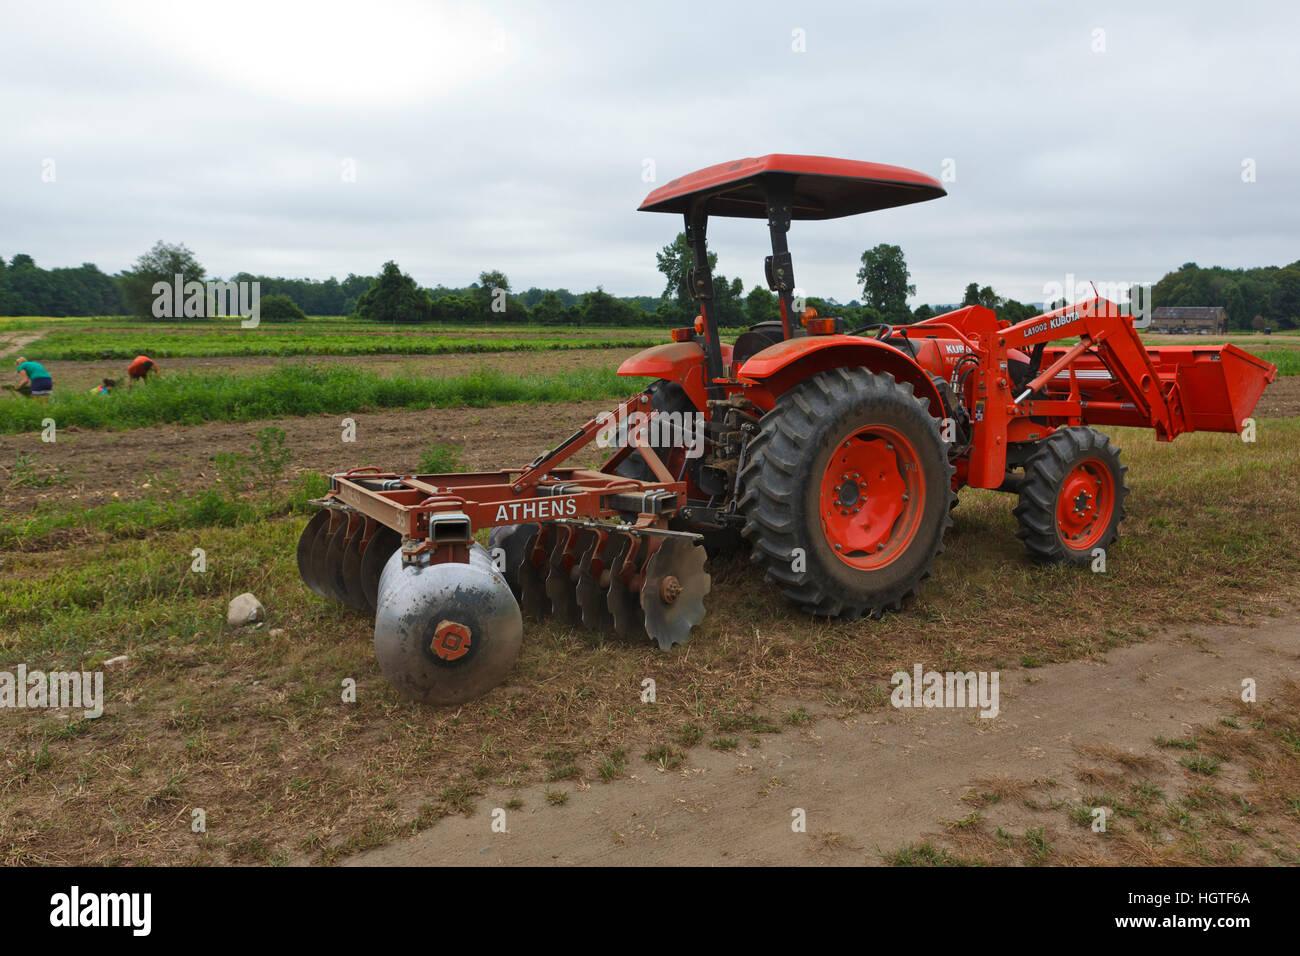 Kubota Tractor In Stock Photos & Kubota Tractor In Stock Images - Alamy